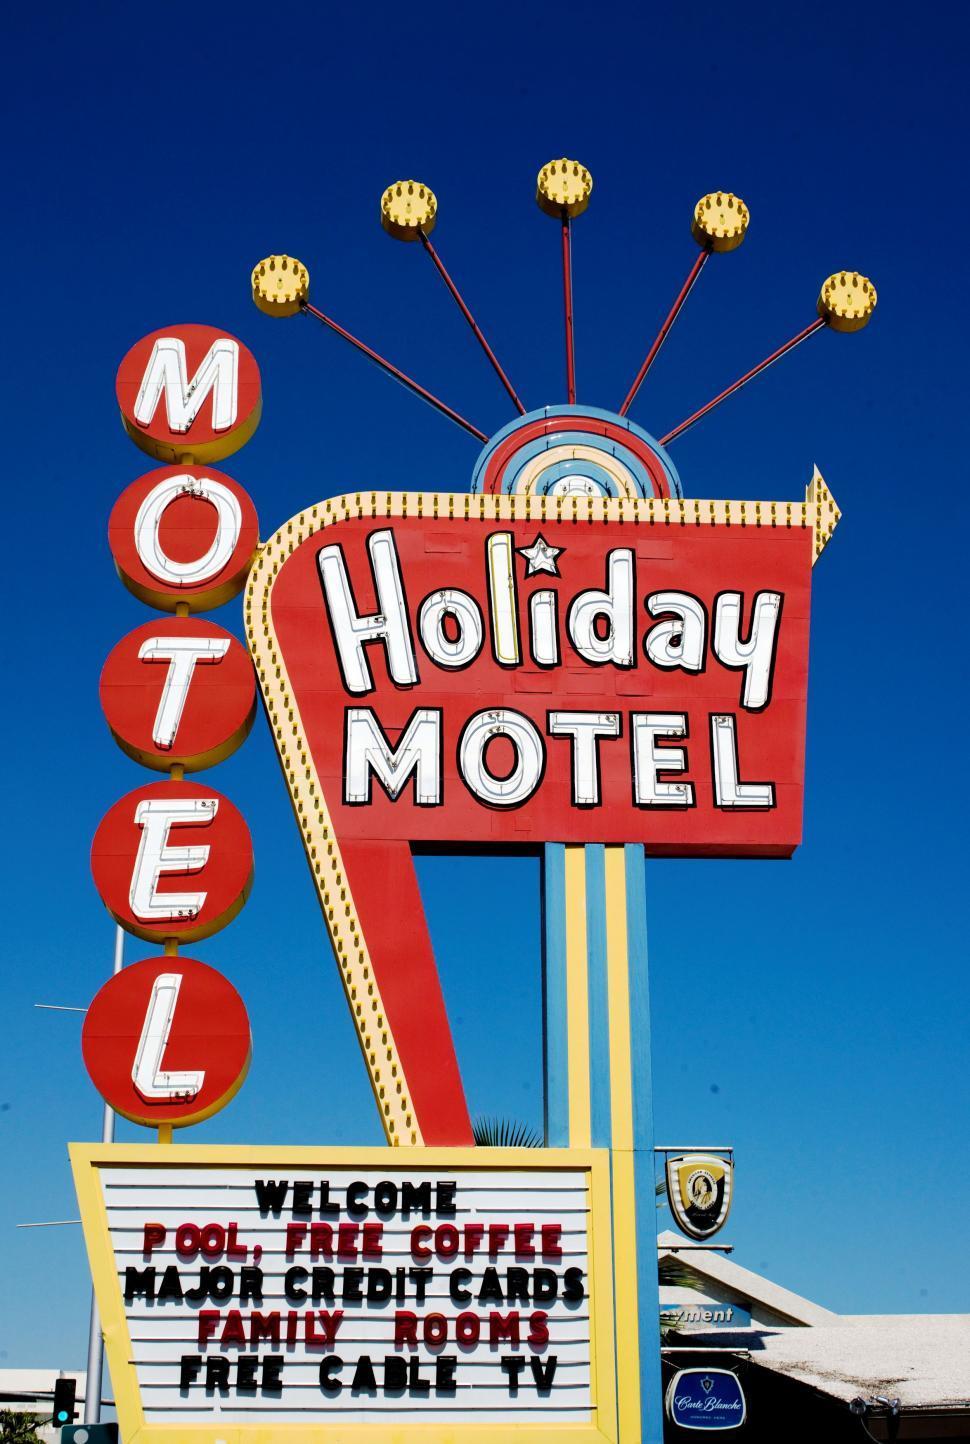 Download Free Stock Photo of Holiday Motel, Las Vegas